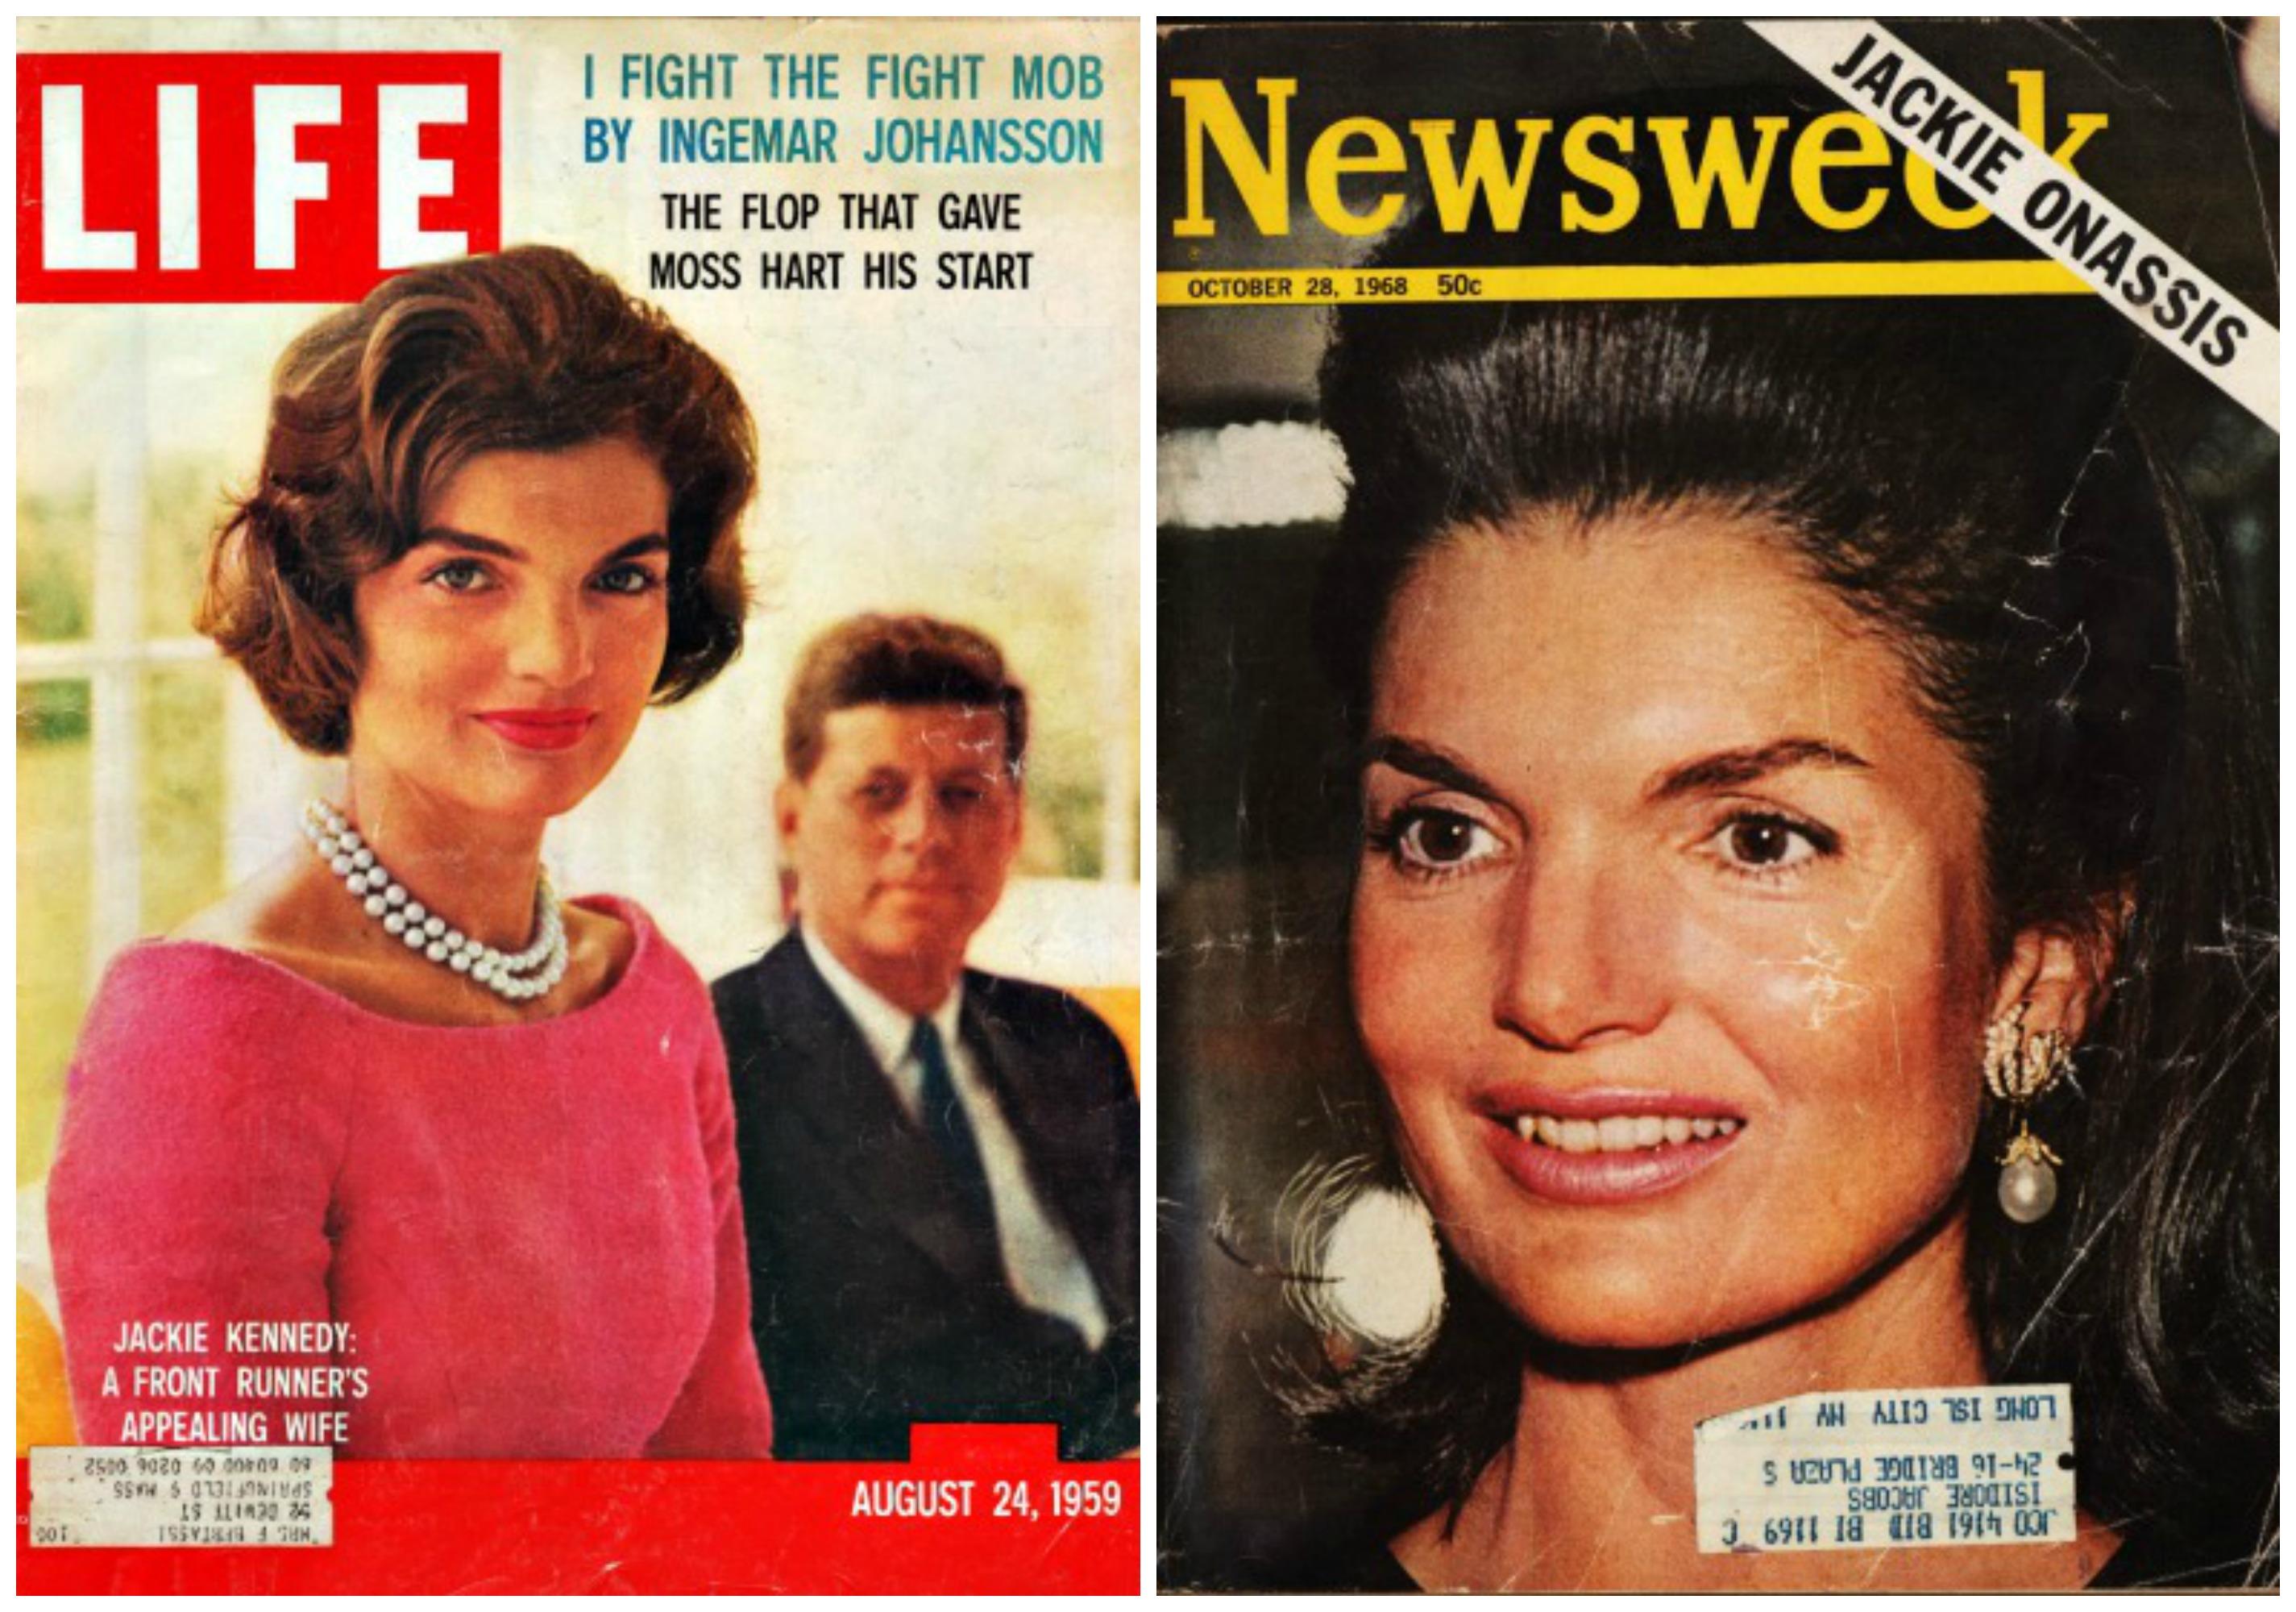 Vintage Newsweek Magazine 1951 Nov 12 Margaret Truman - Seagram's Gin